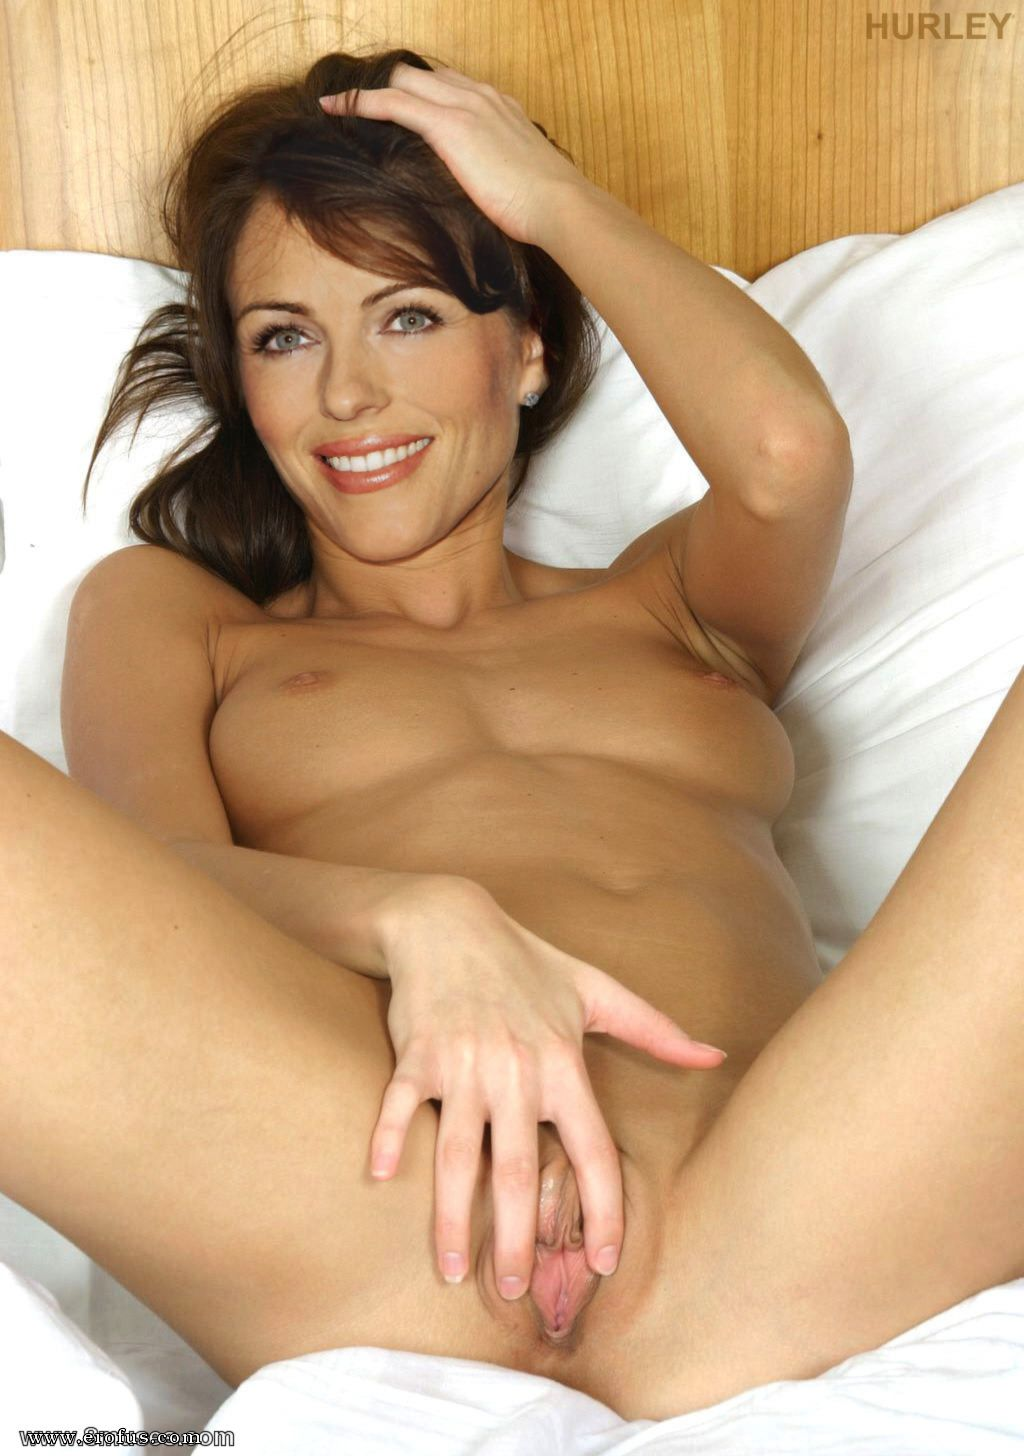 Elizabeth hurley sex pics